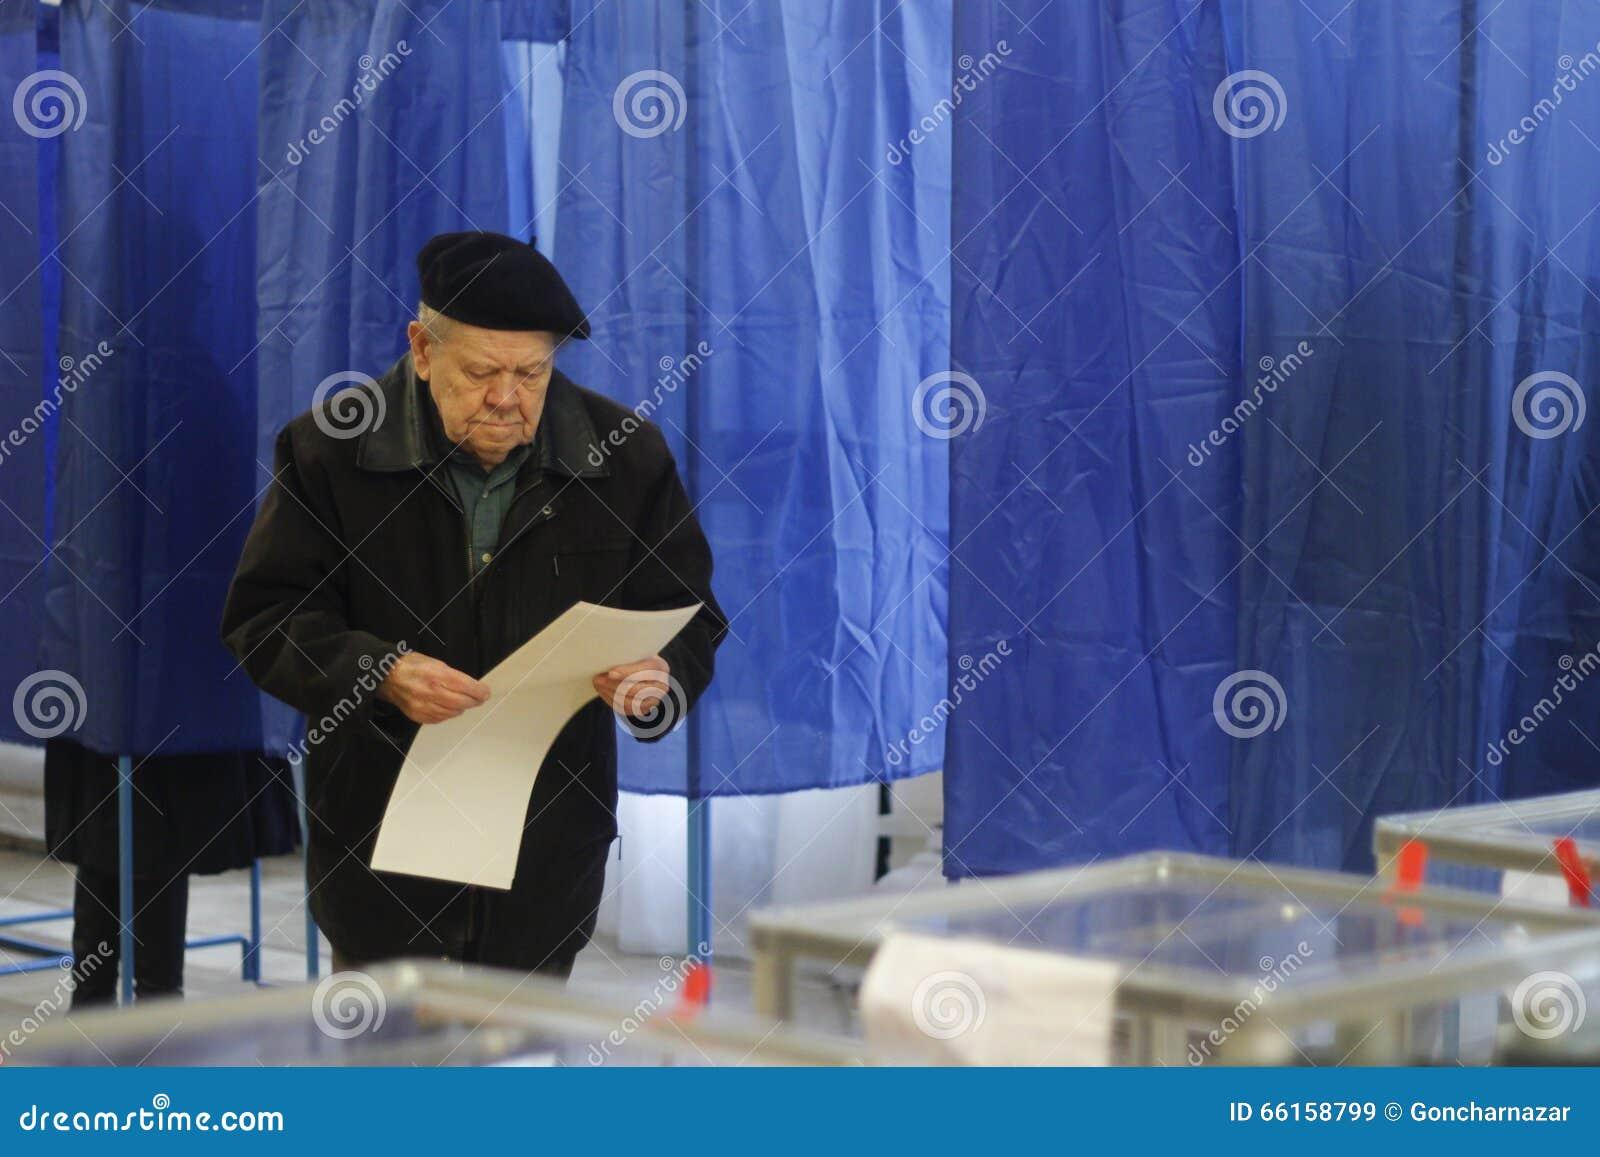 KIEV, de OEKRAÏNE - Oktober 25, 2015: Regelmatig geplande lokale verkiezingen in de Oekraïne